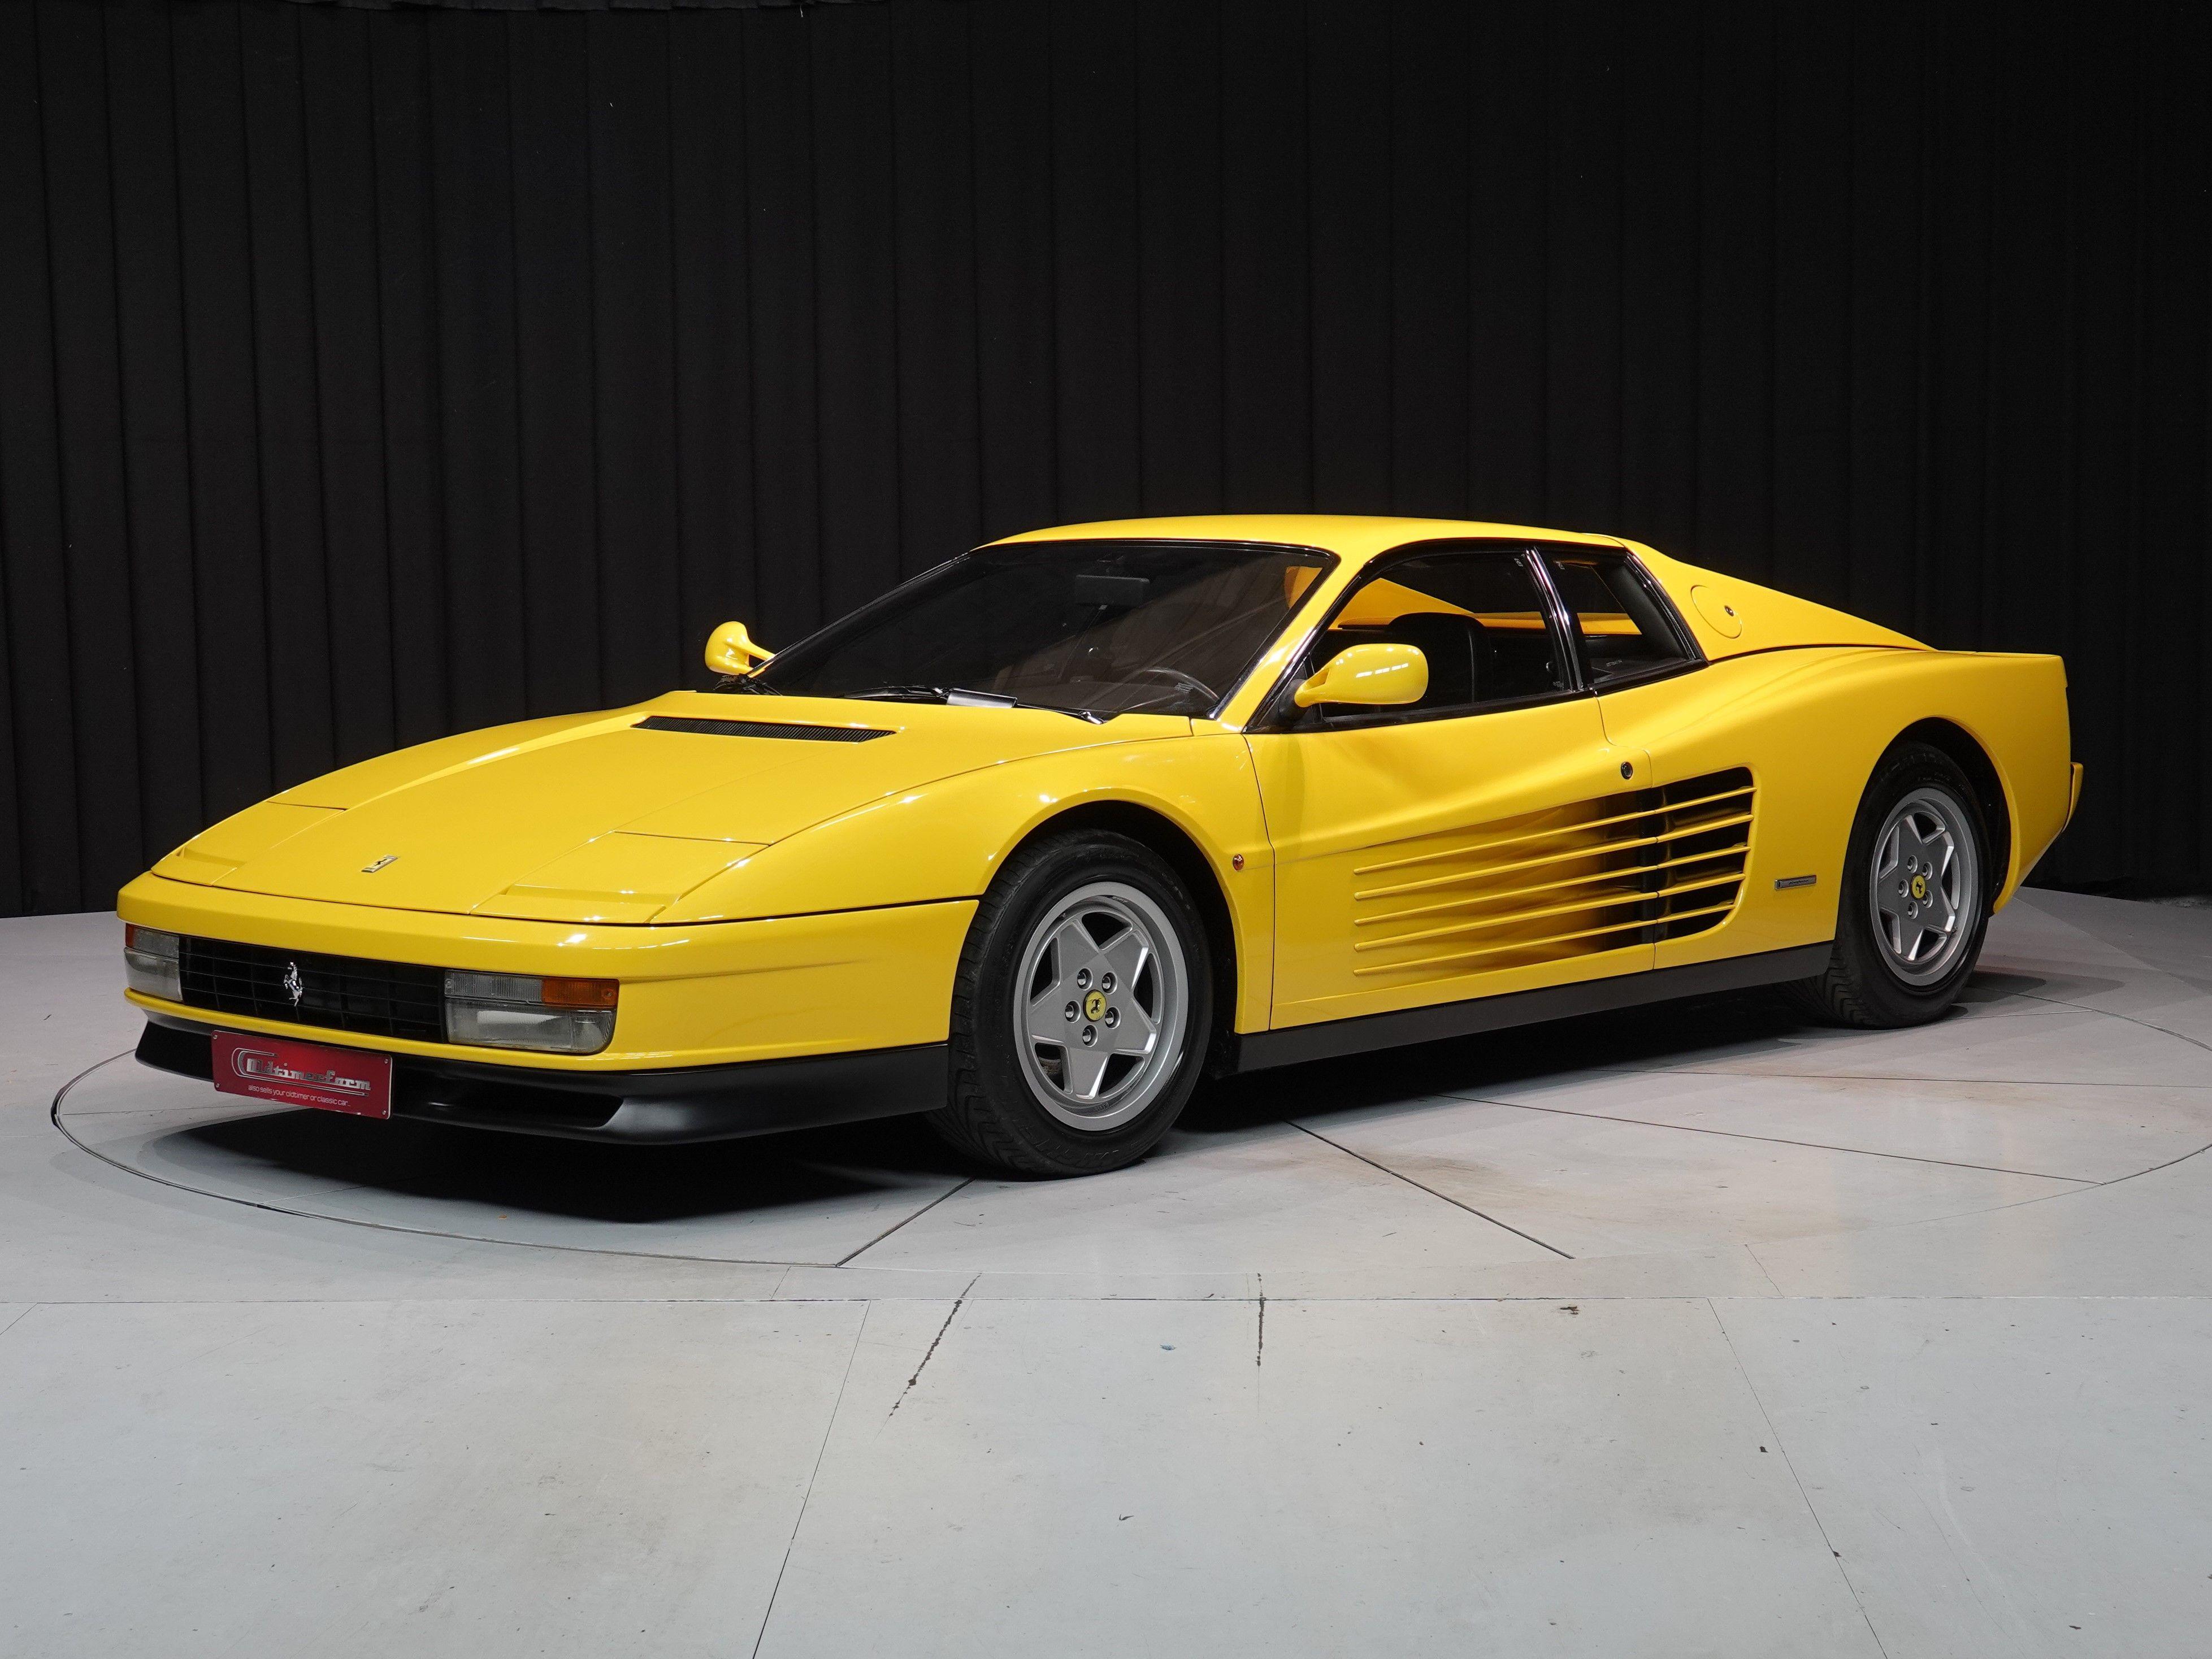 Ferrari Testarossa Yellow 1990 Oldtimerfarm Bv Ferrari Ferrari Testarossa Luxury Cars